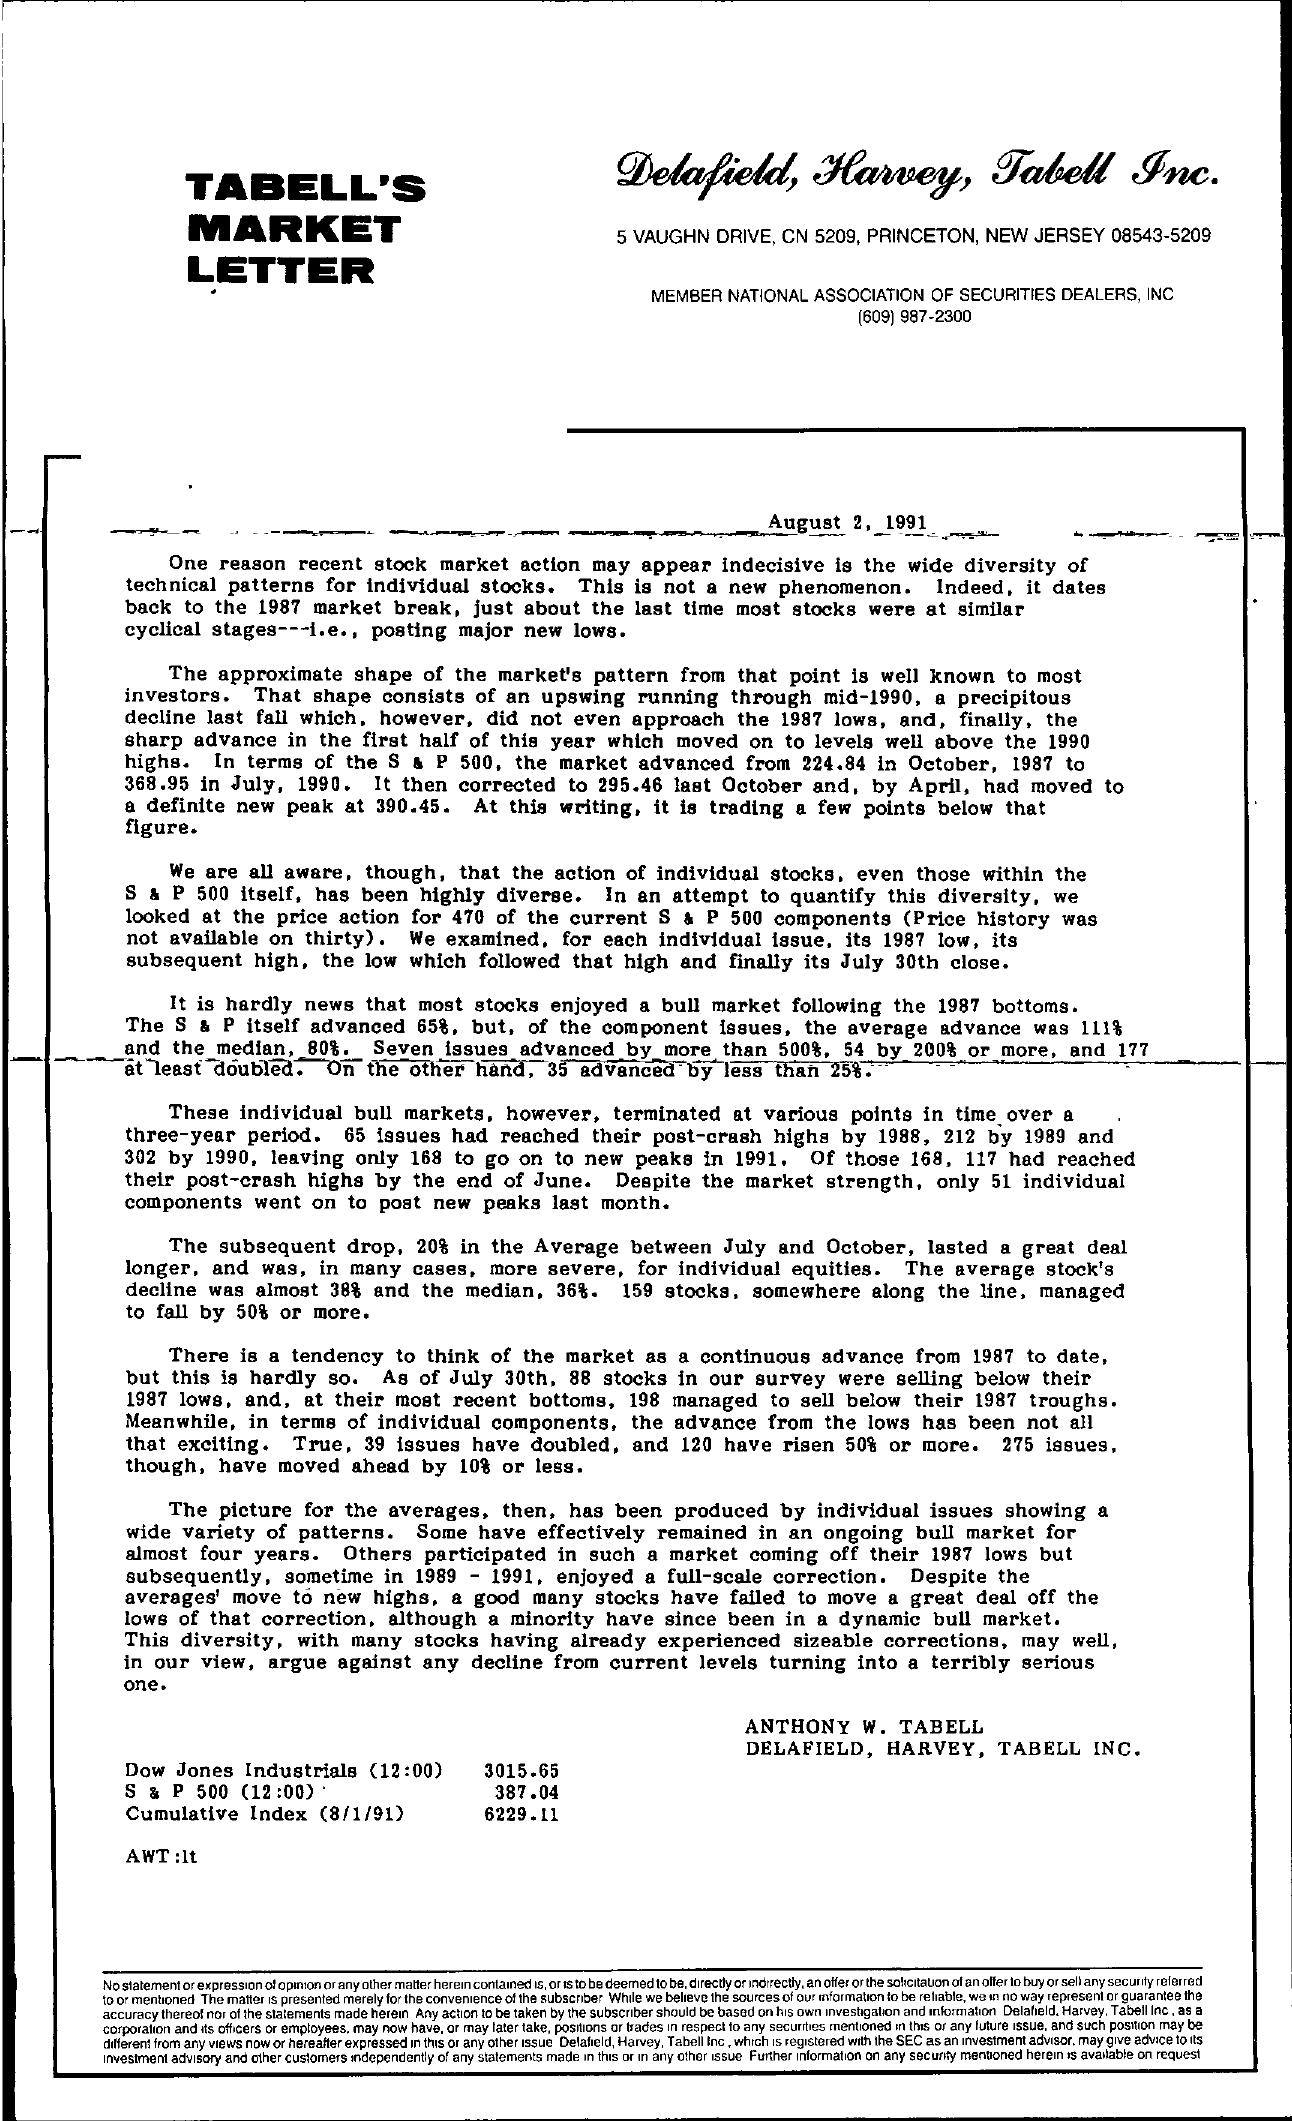 Tabell's Market Letter - August 02, 1991